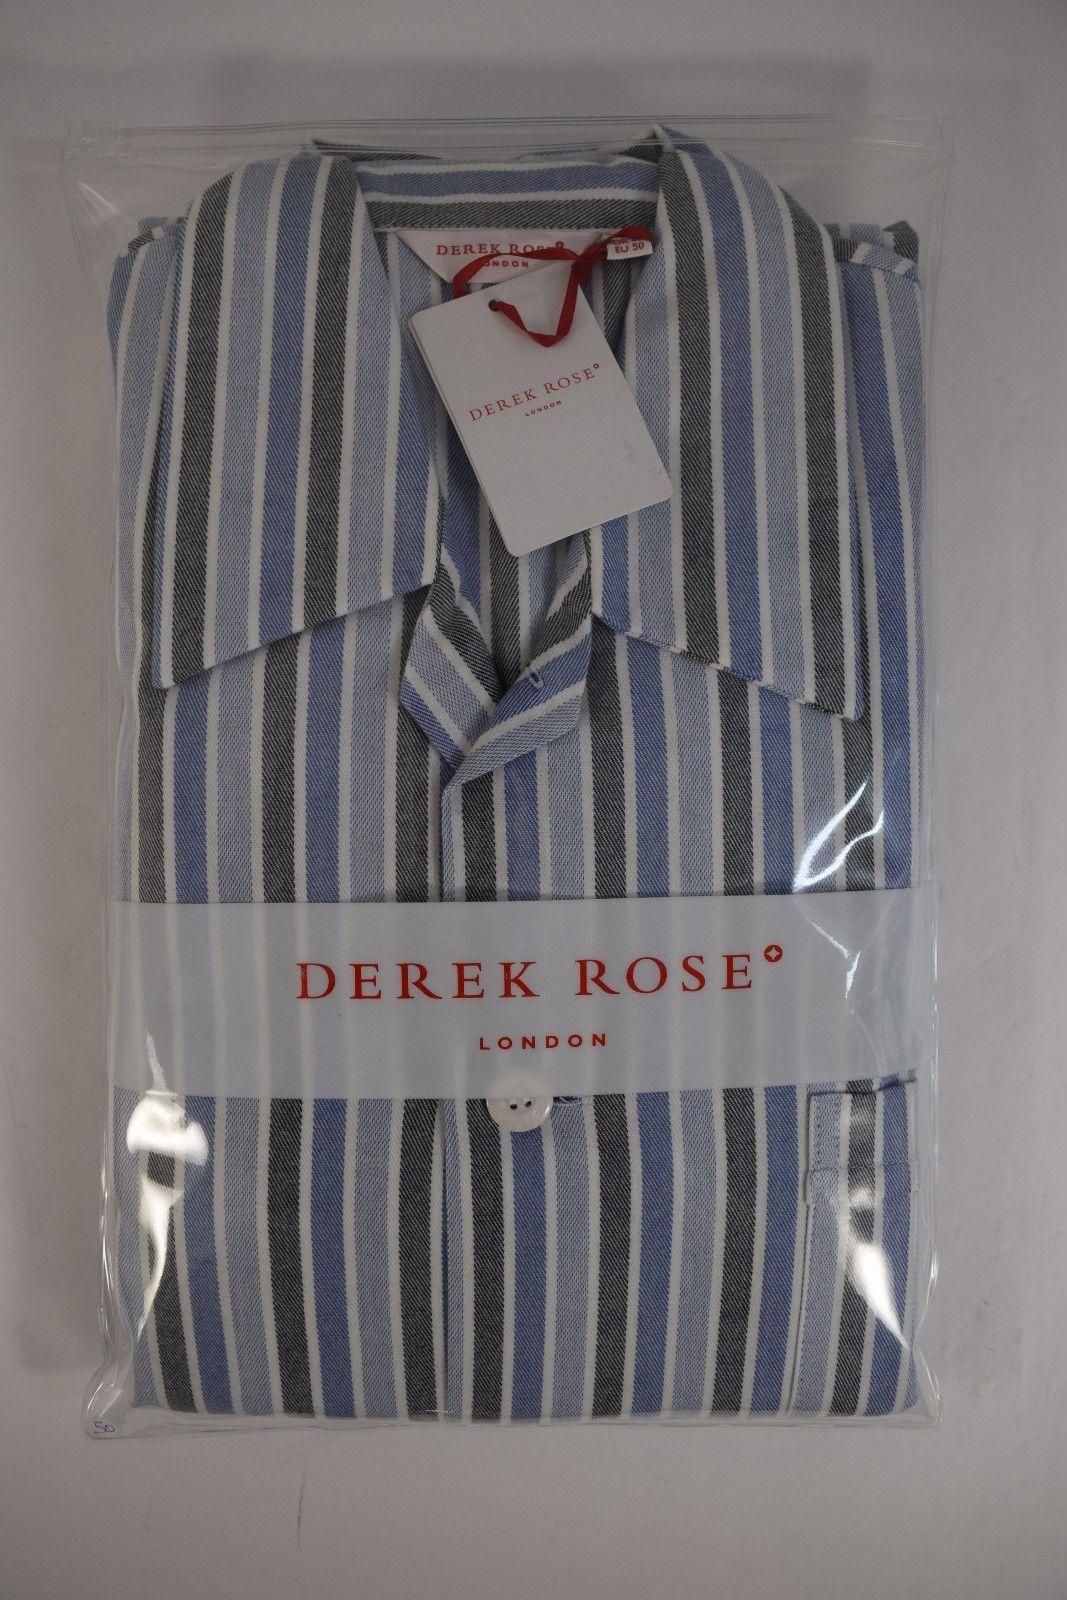 8ab5721620 DEREK ROSE pigiama uomo lungo APERTO FLANELLA cotone A/I righe tg ...